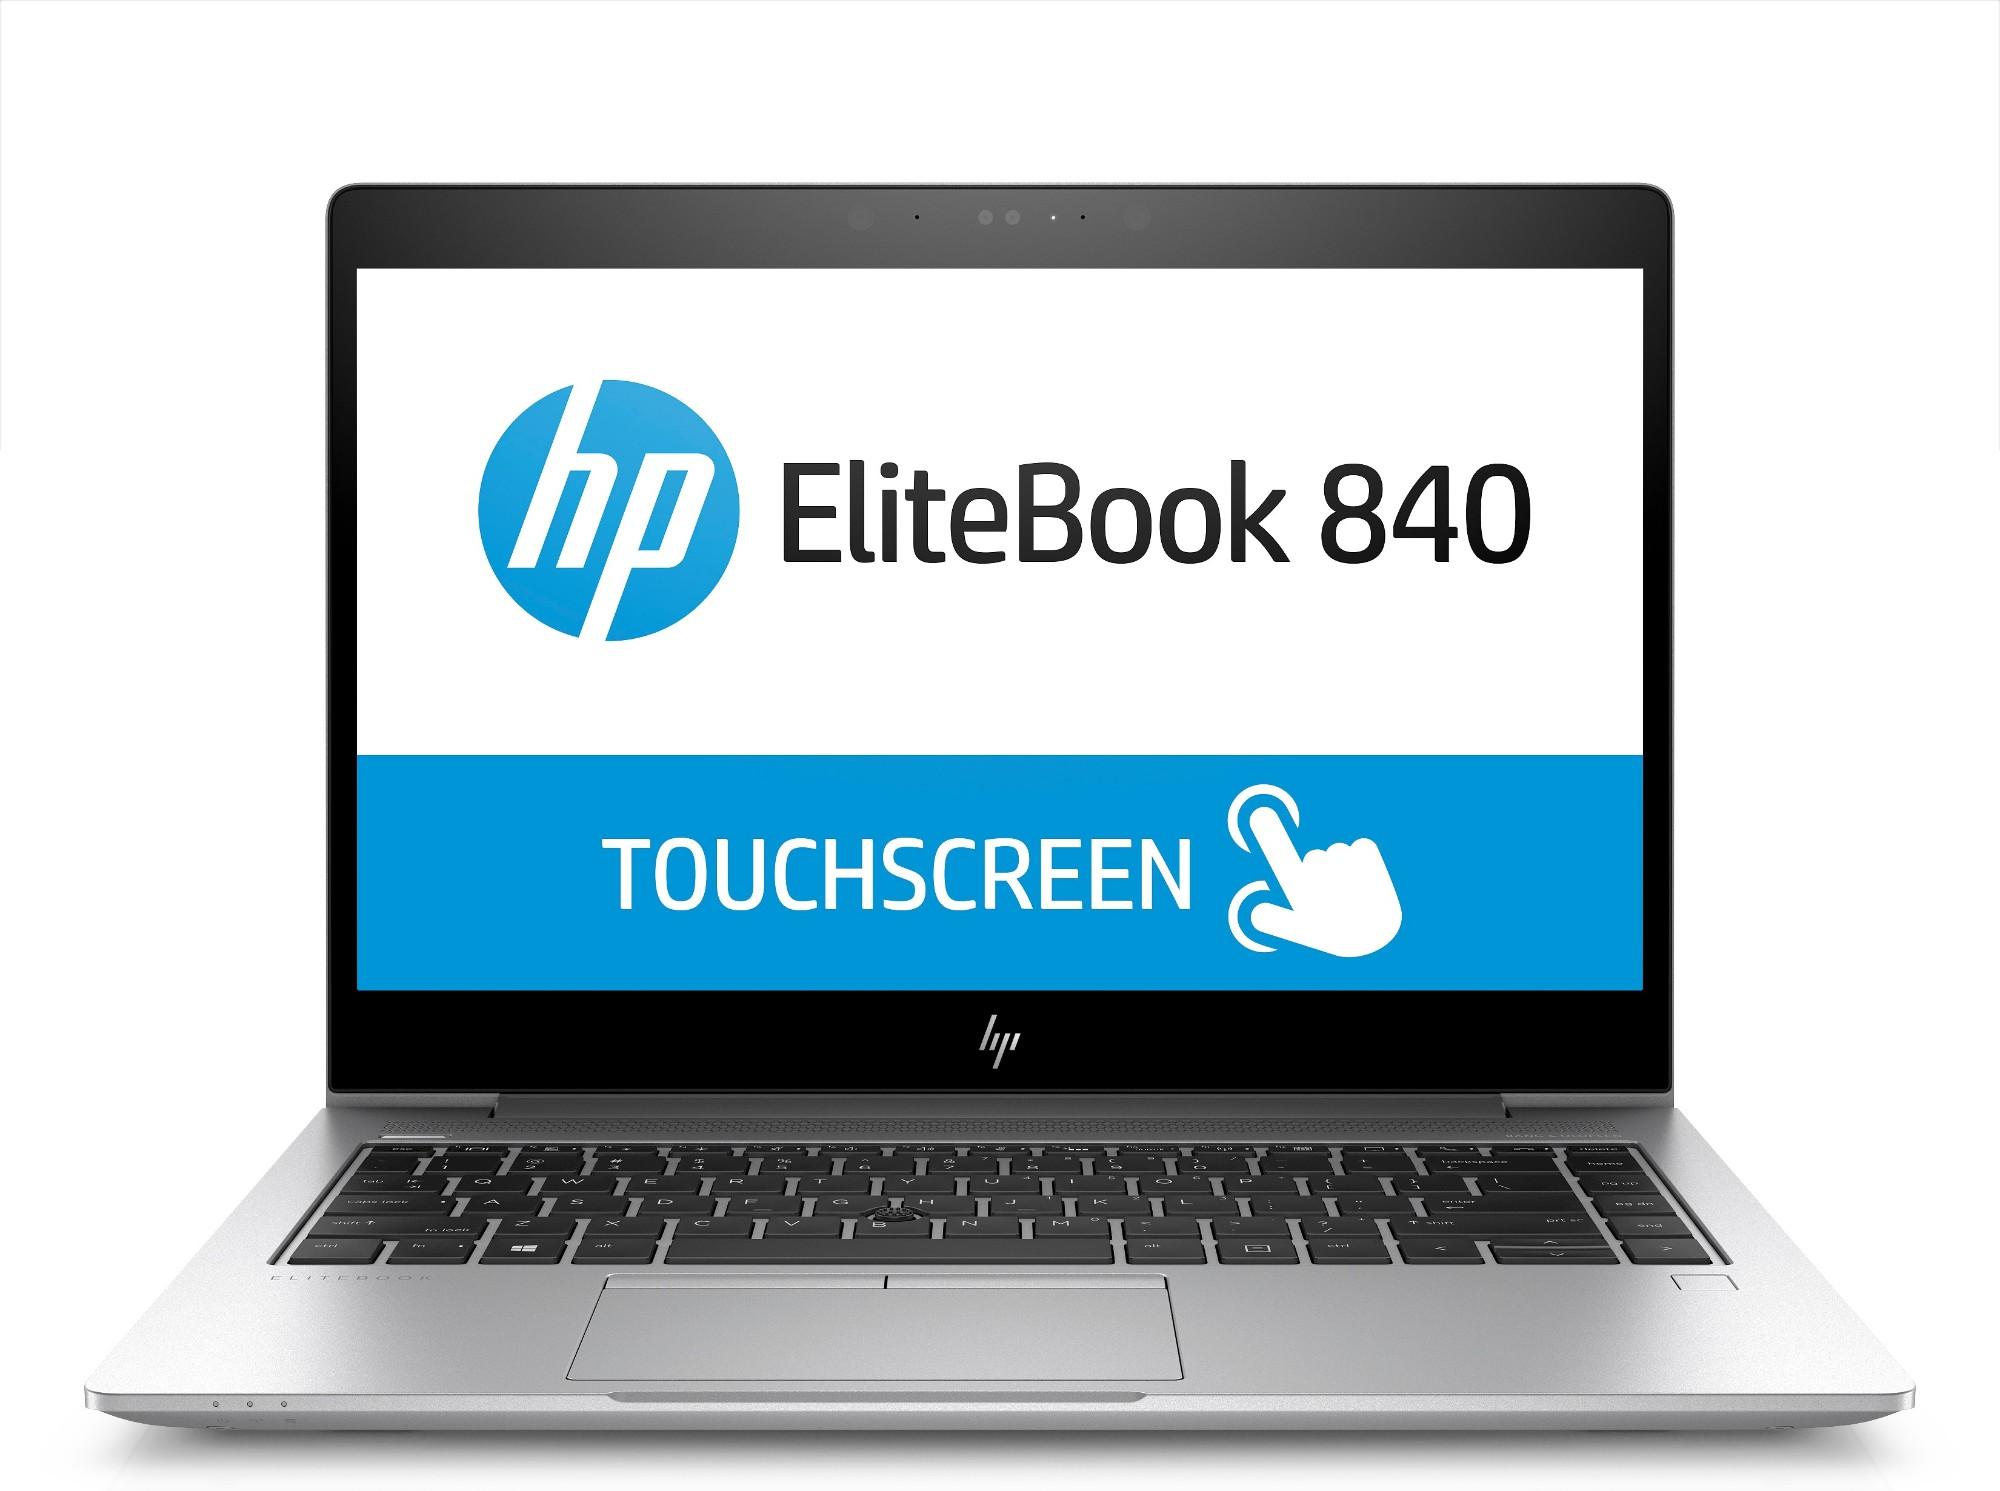 HP EliteBook 840 G5 Silver Notebook 35.6 cm (14